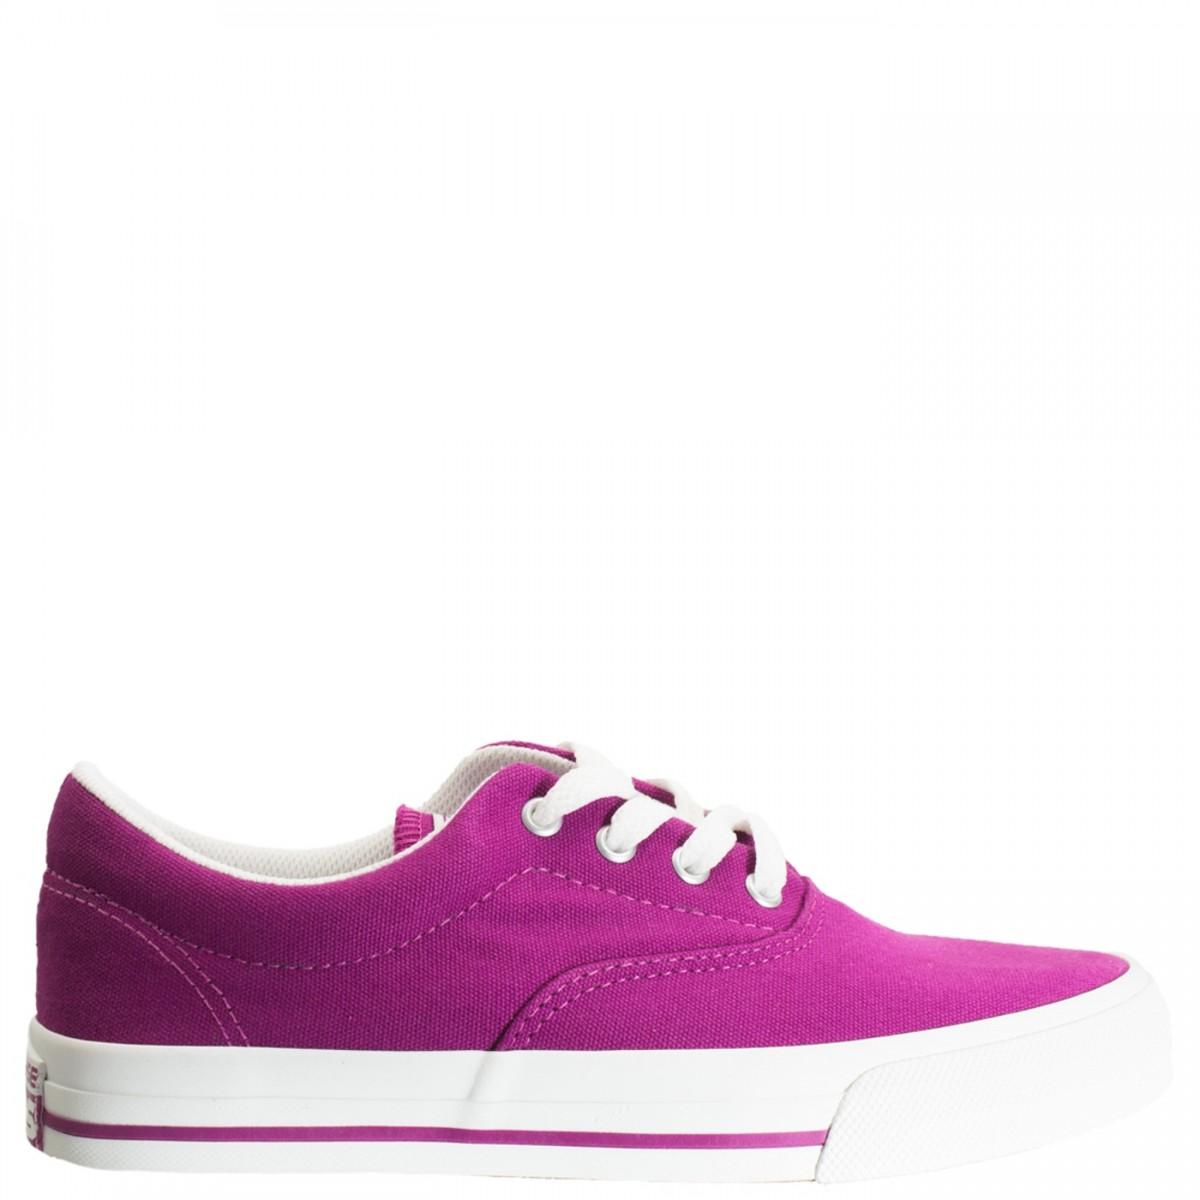 8e51582f14b Bizz Store - Tênis Converse All Star Feminino Rosa Skidgrip